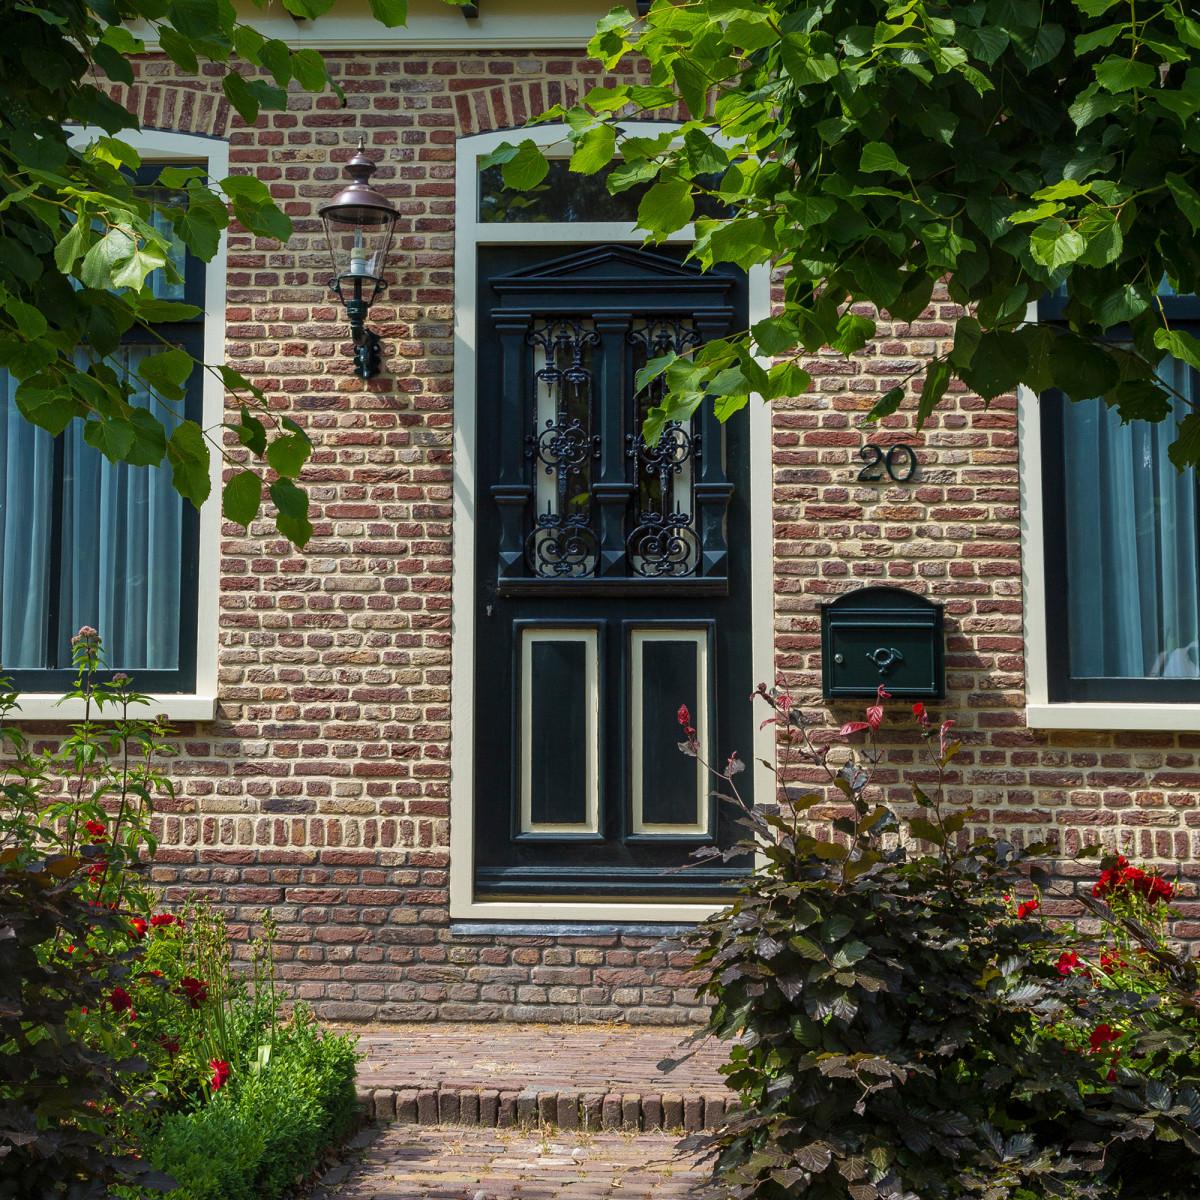 Huisnummer 2 (5852) - KS Verlichting - Huisnummers